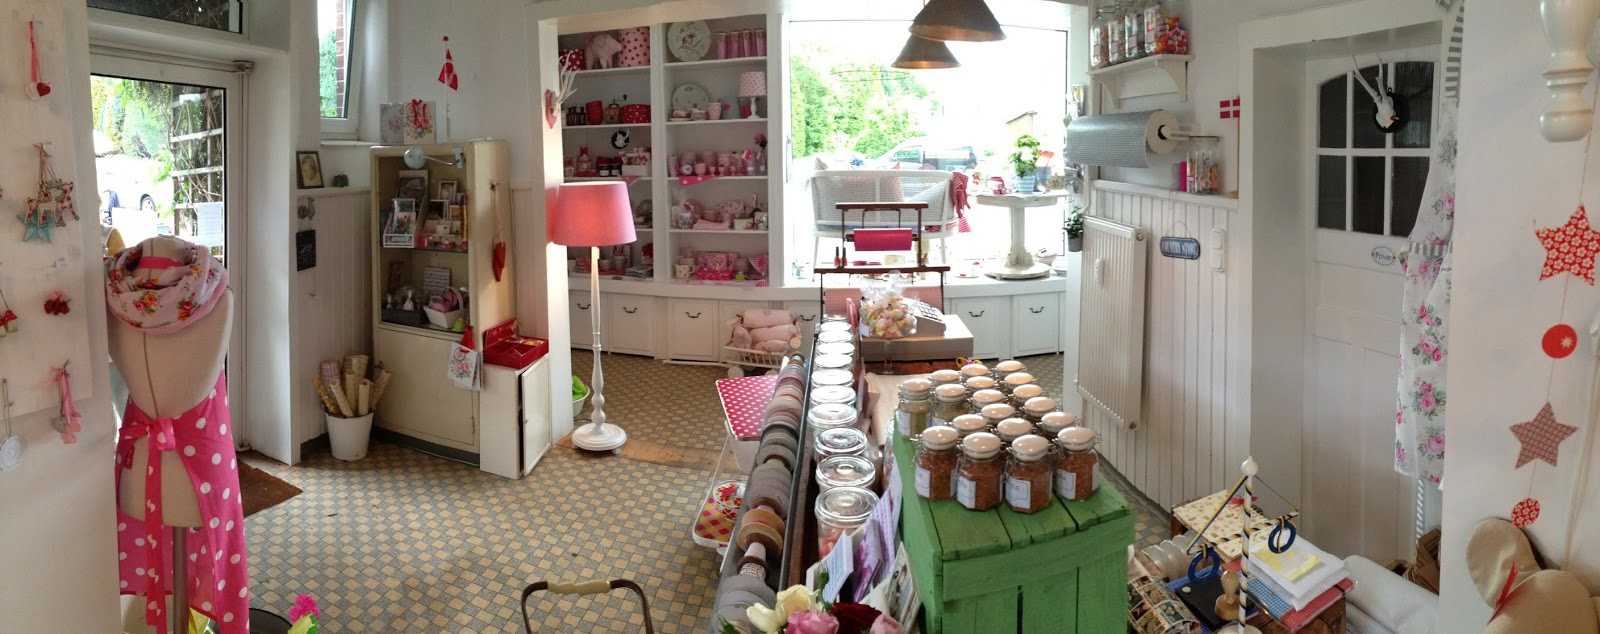 harry sally wohn und geschenkideen online shop seit 2005 ladengesch ft. Black Bedroom Furniture Sets. Home Design Ideas